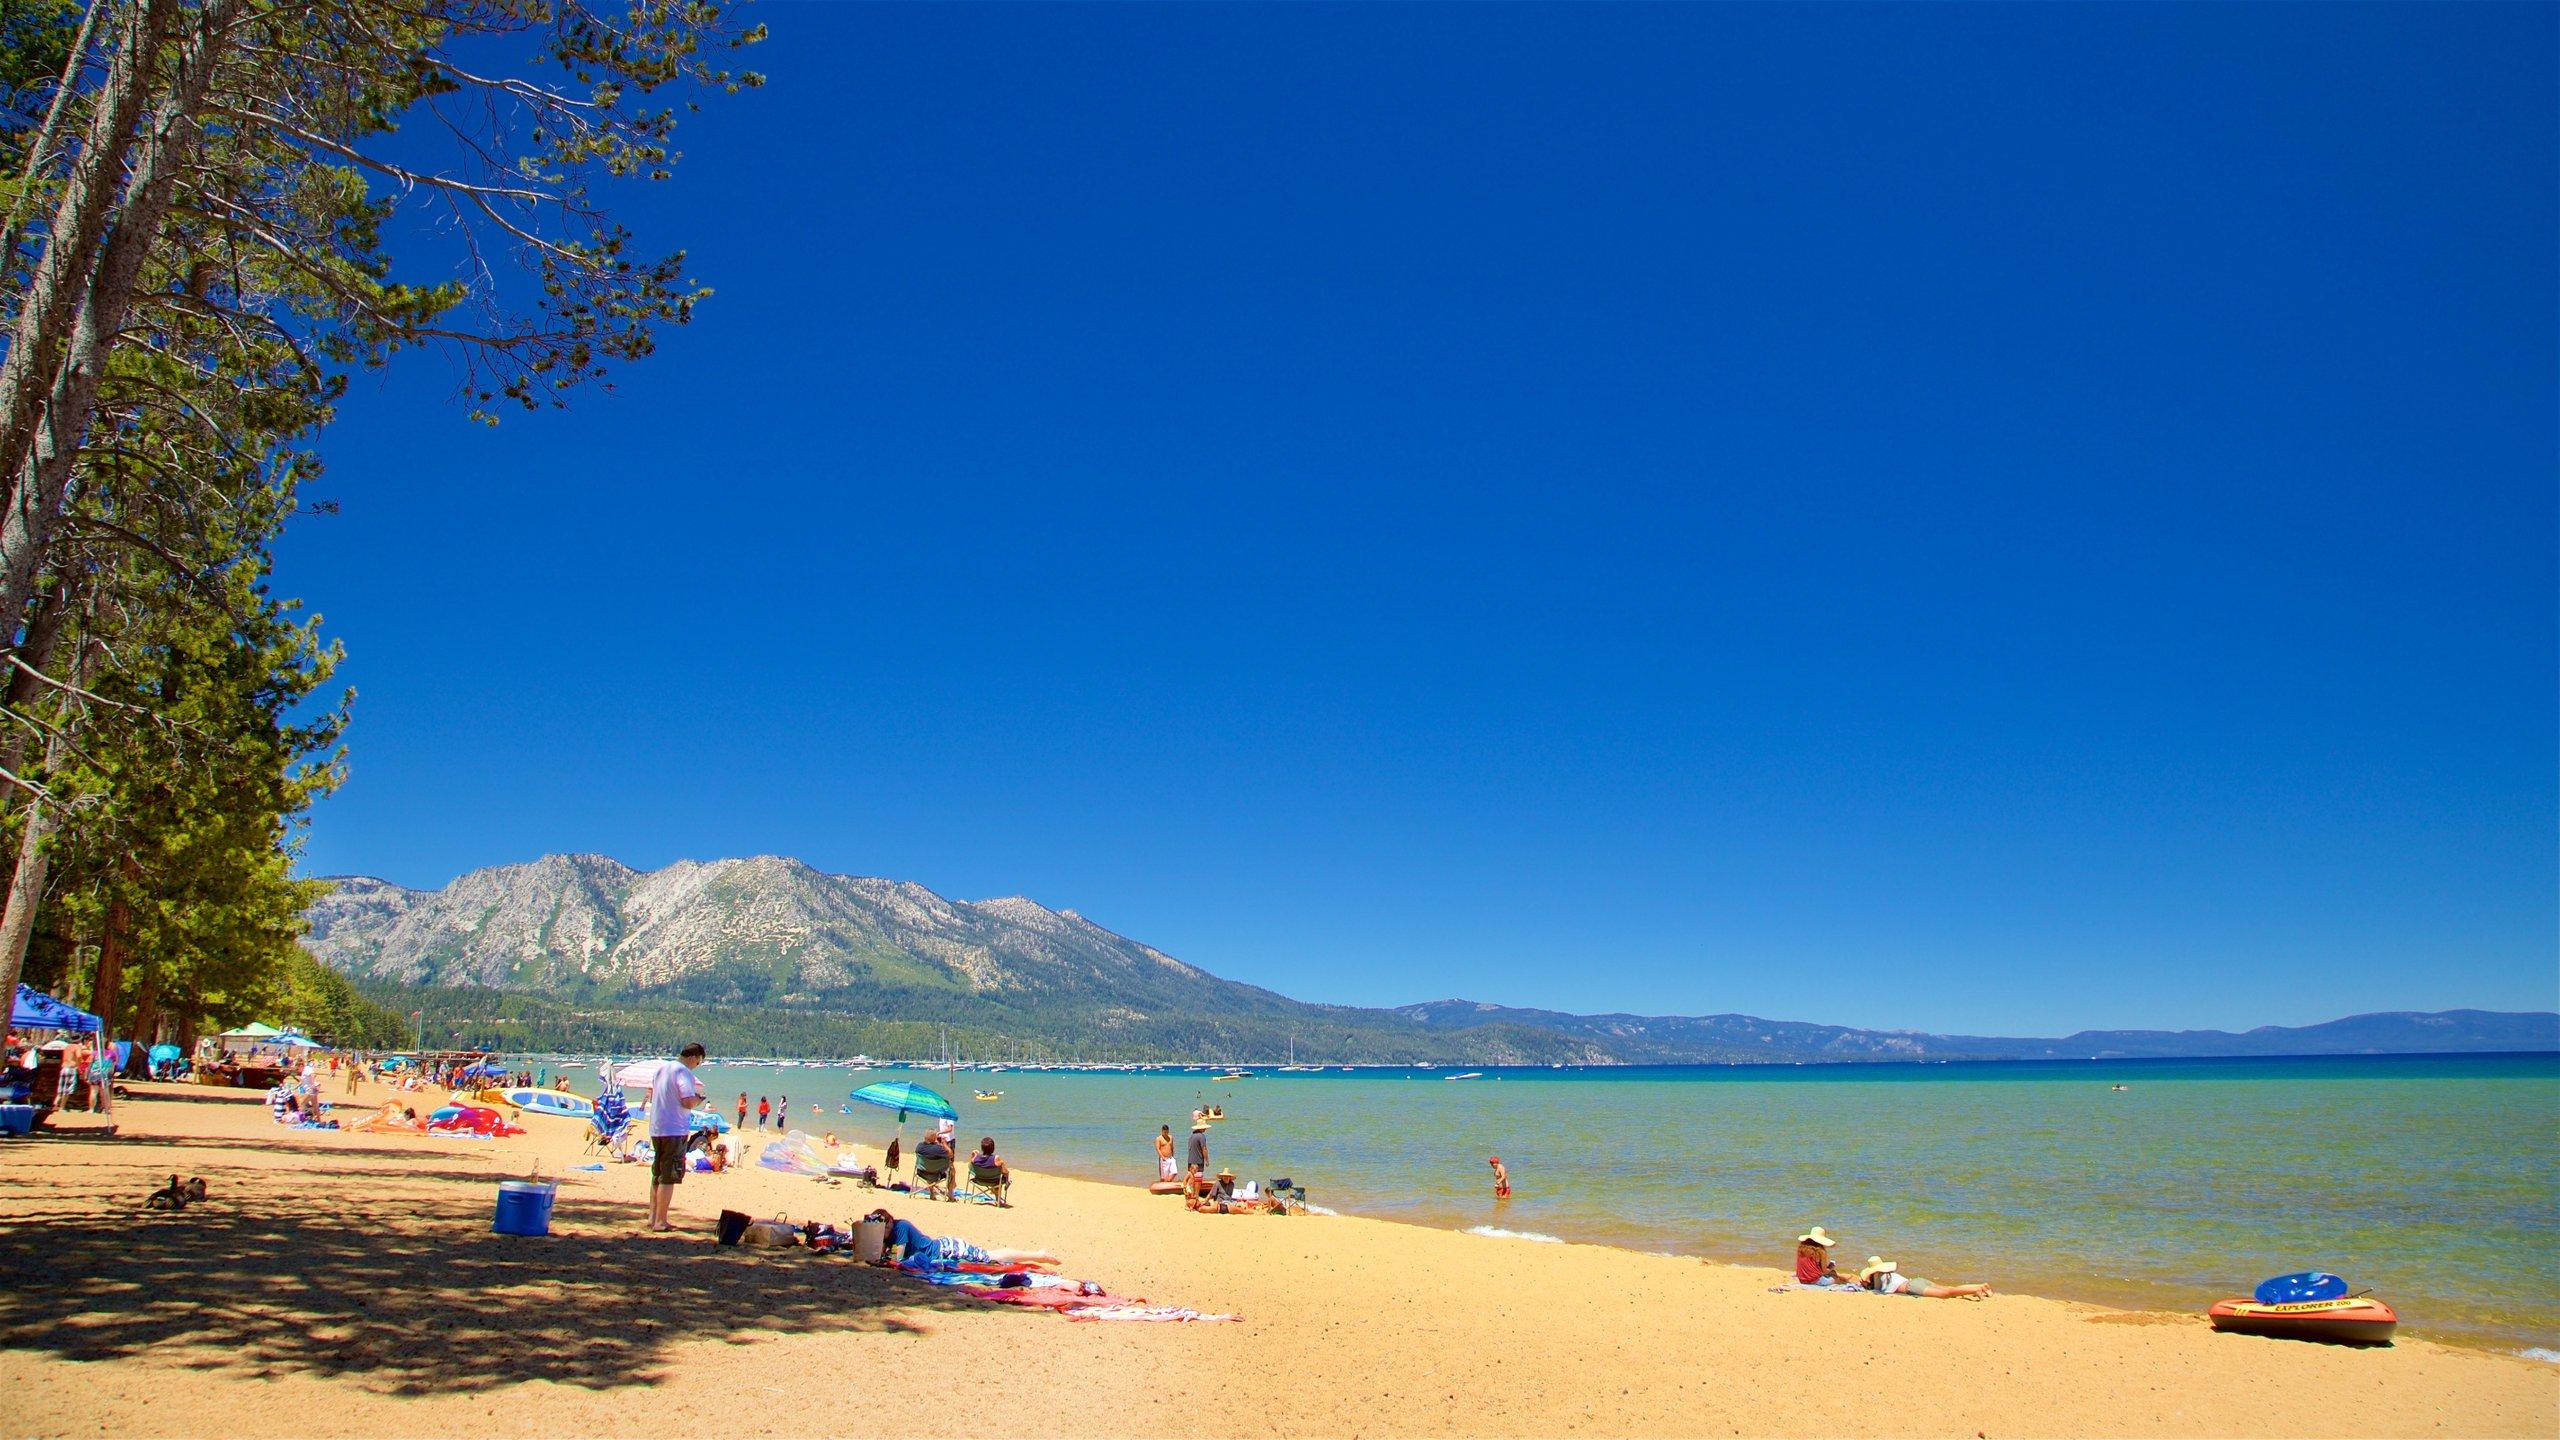 Lake Tahoe, California, United States of America